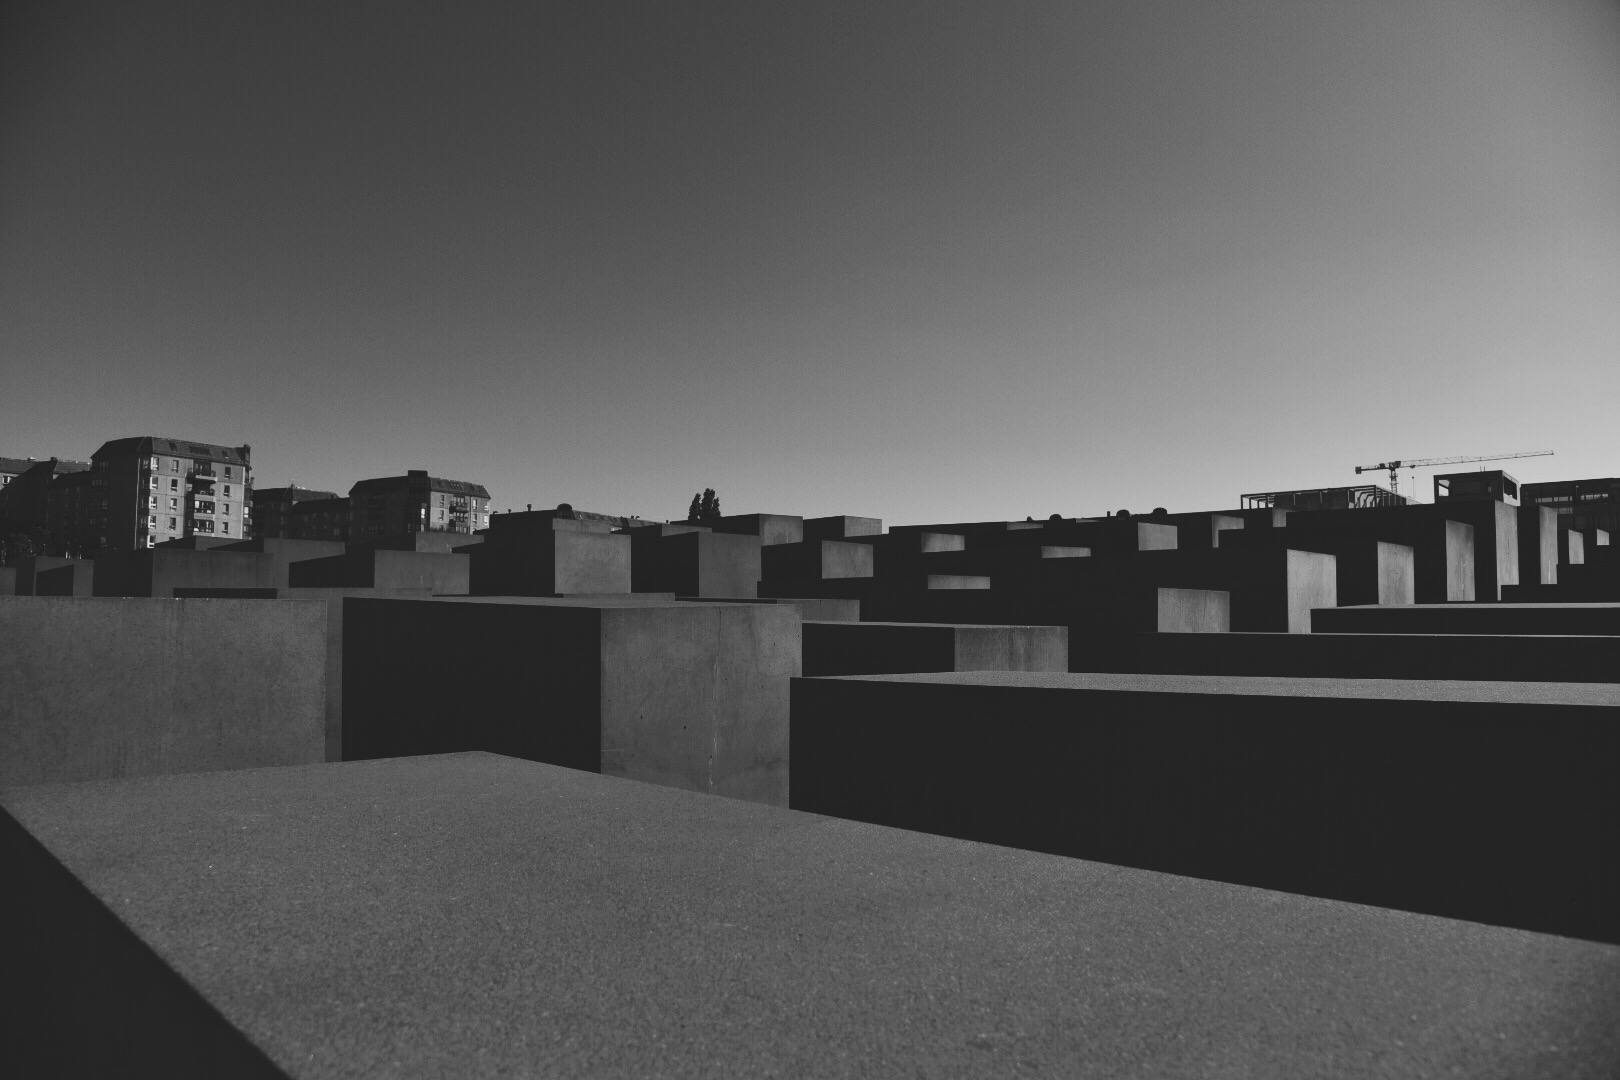 Denkmal für die ermordeten Juden Europas, Berlin, Germany